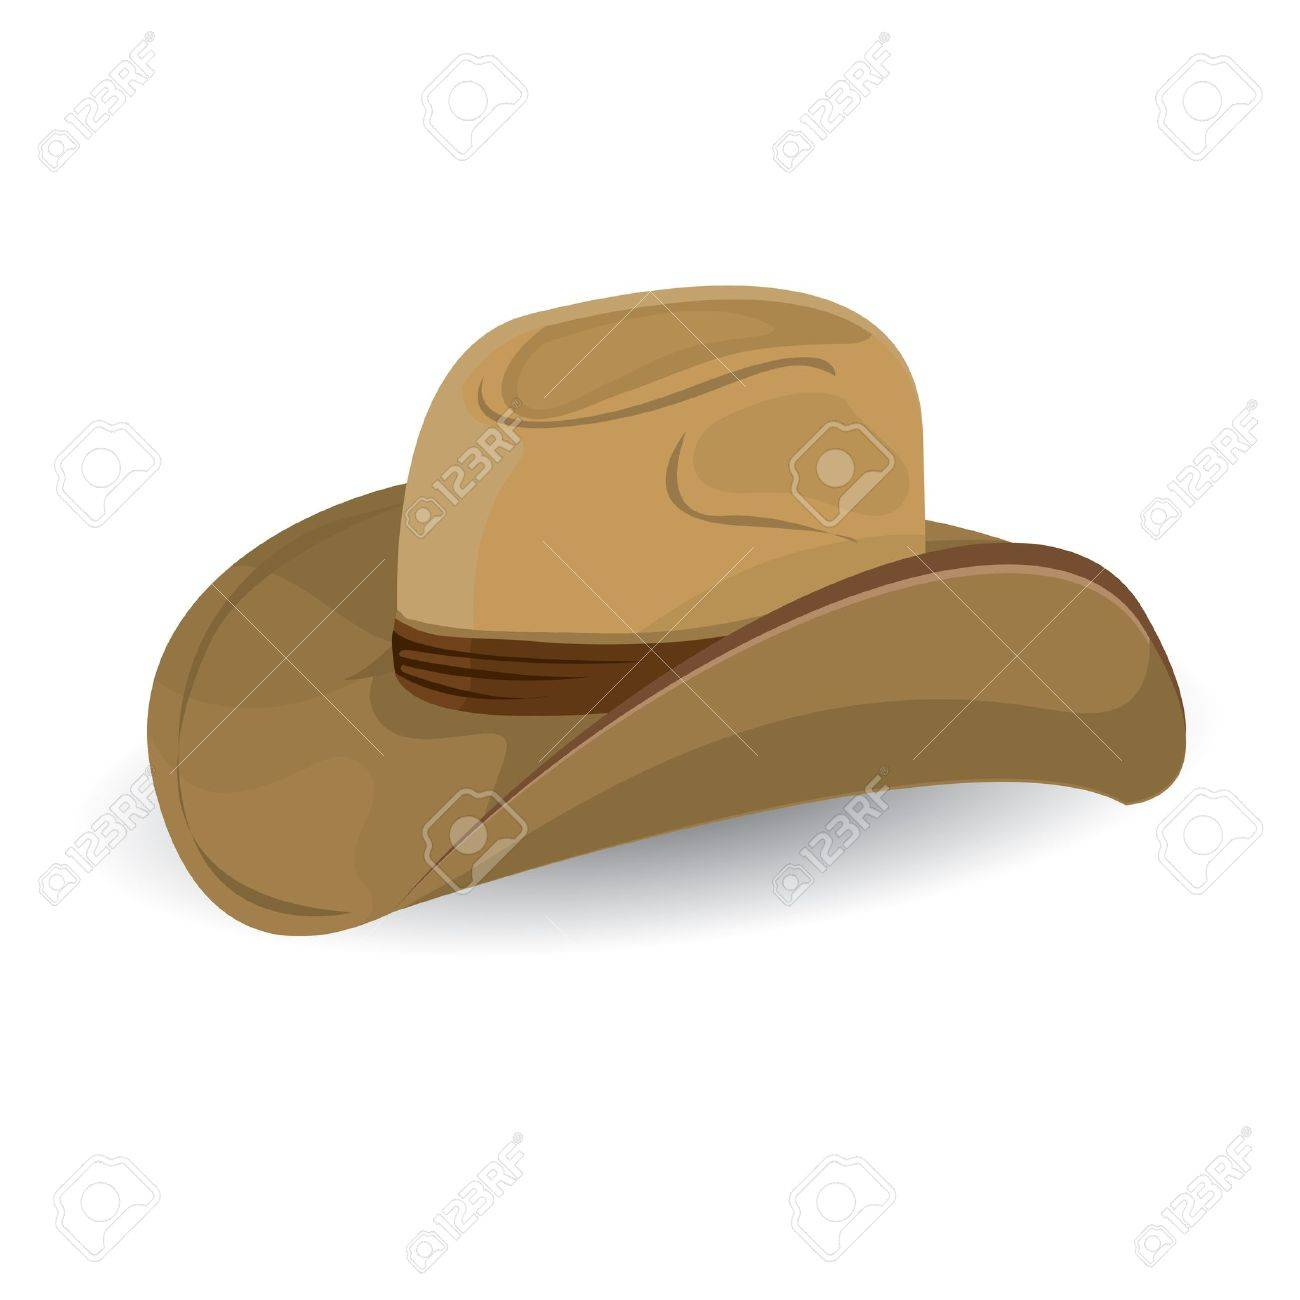 cowboy hat. vector illustration. Stock Vector - 23853767